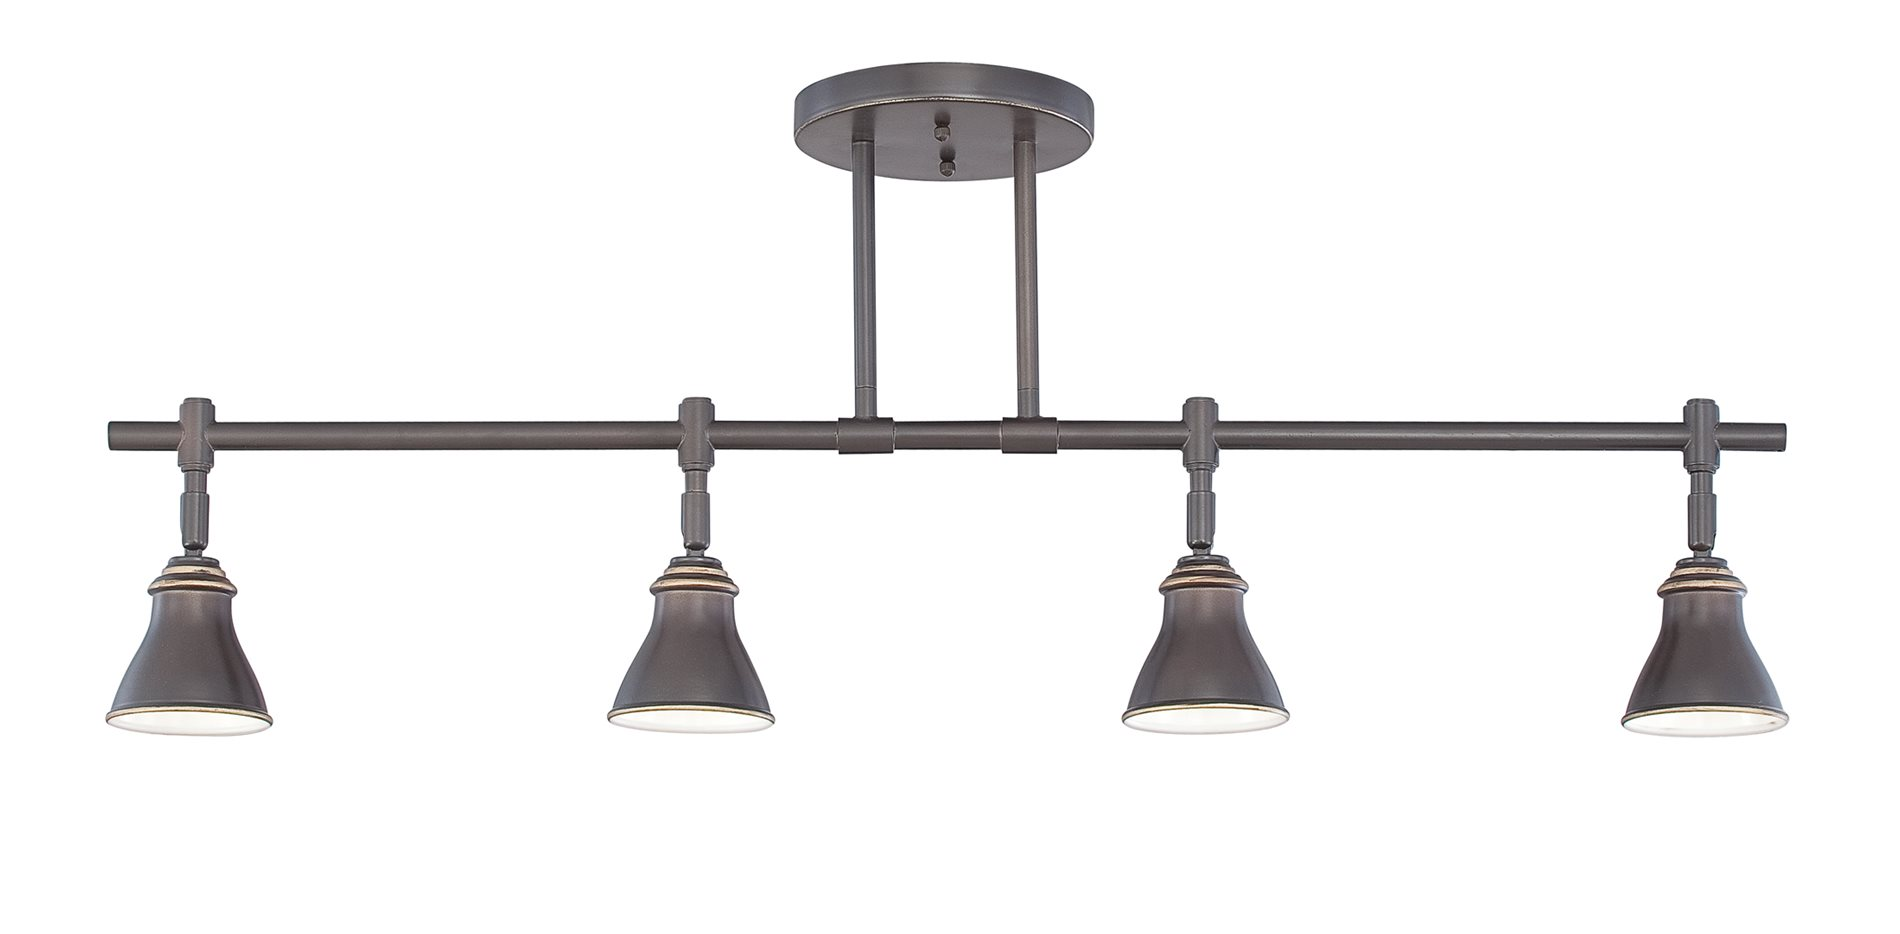 Quoizel Qtr10054pn Contemporary Ceiling Track Light Qz